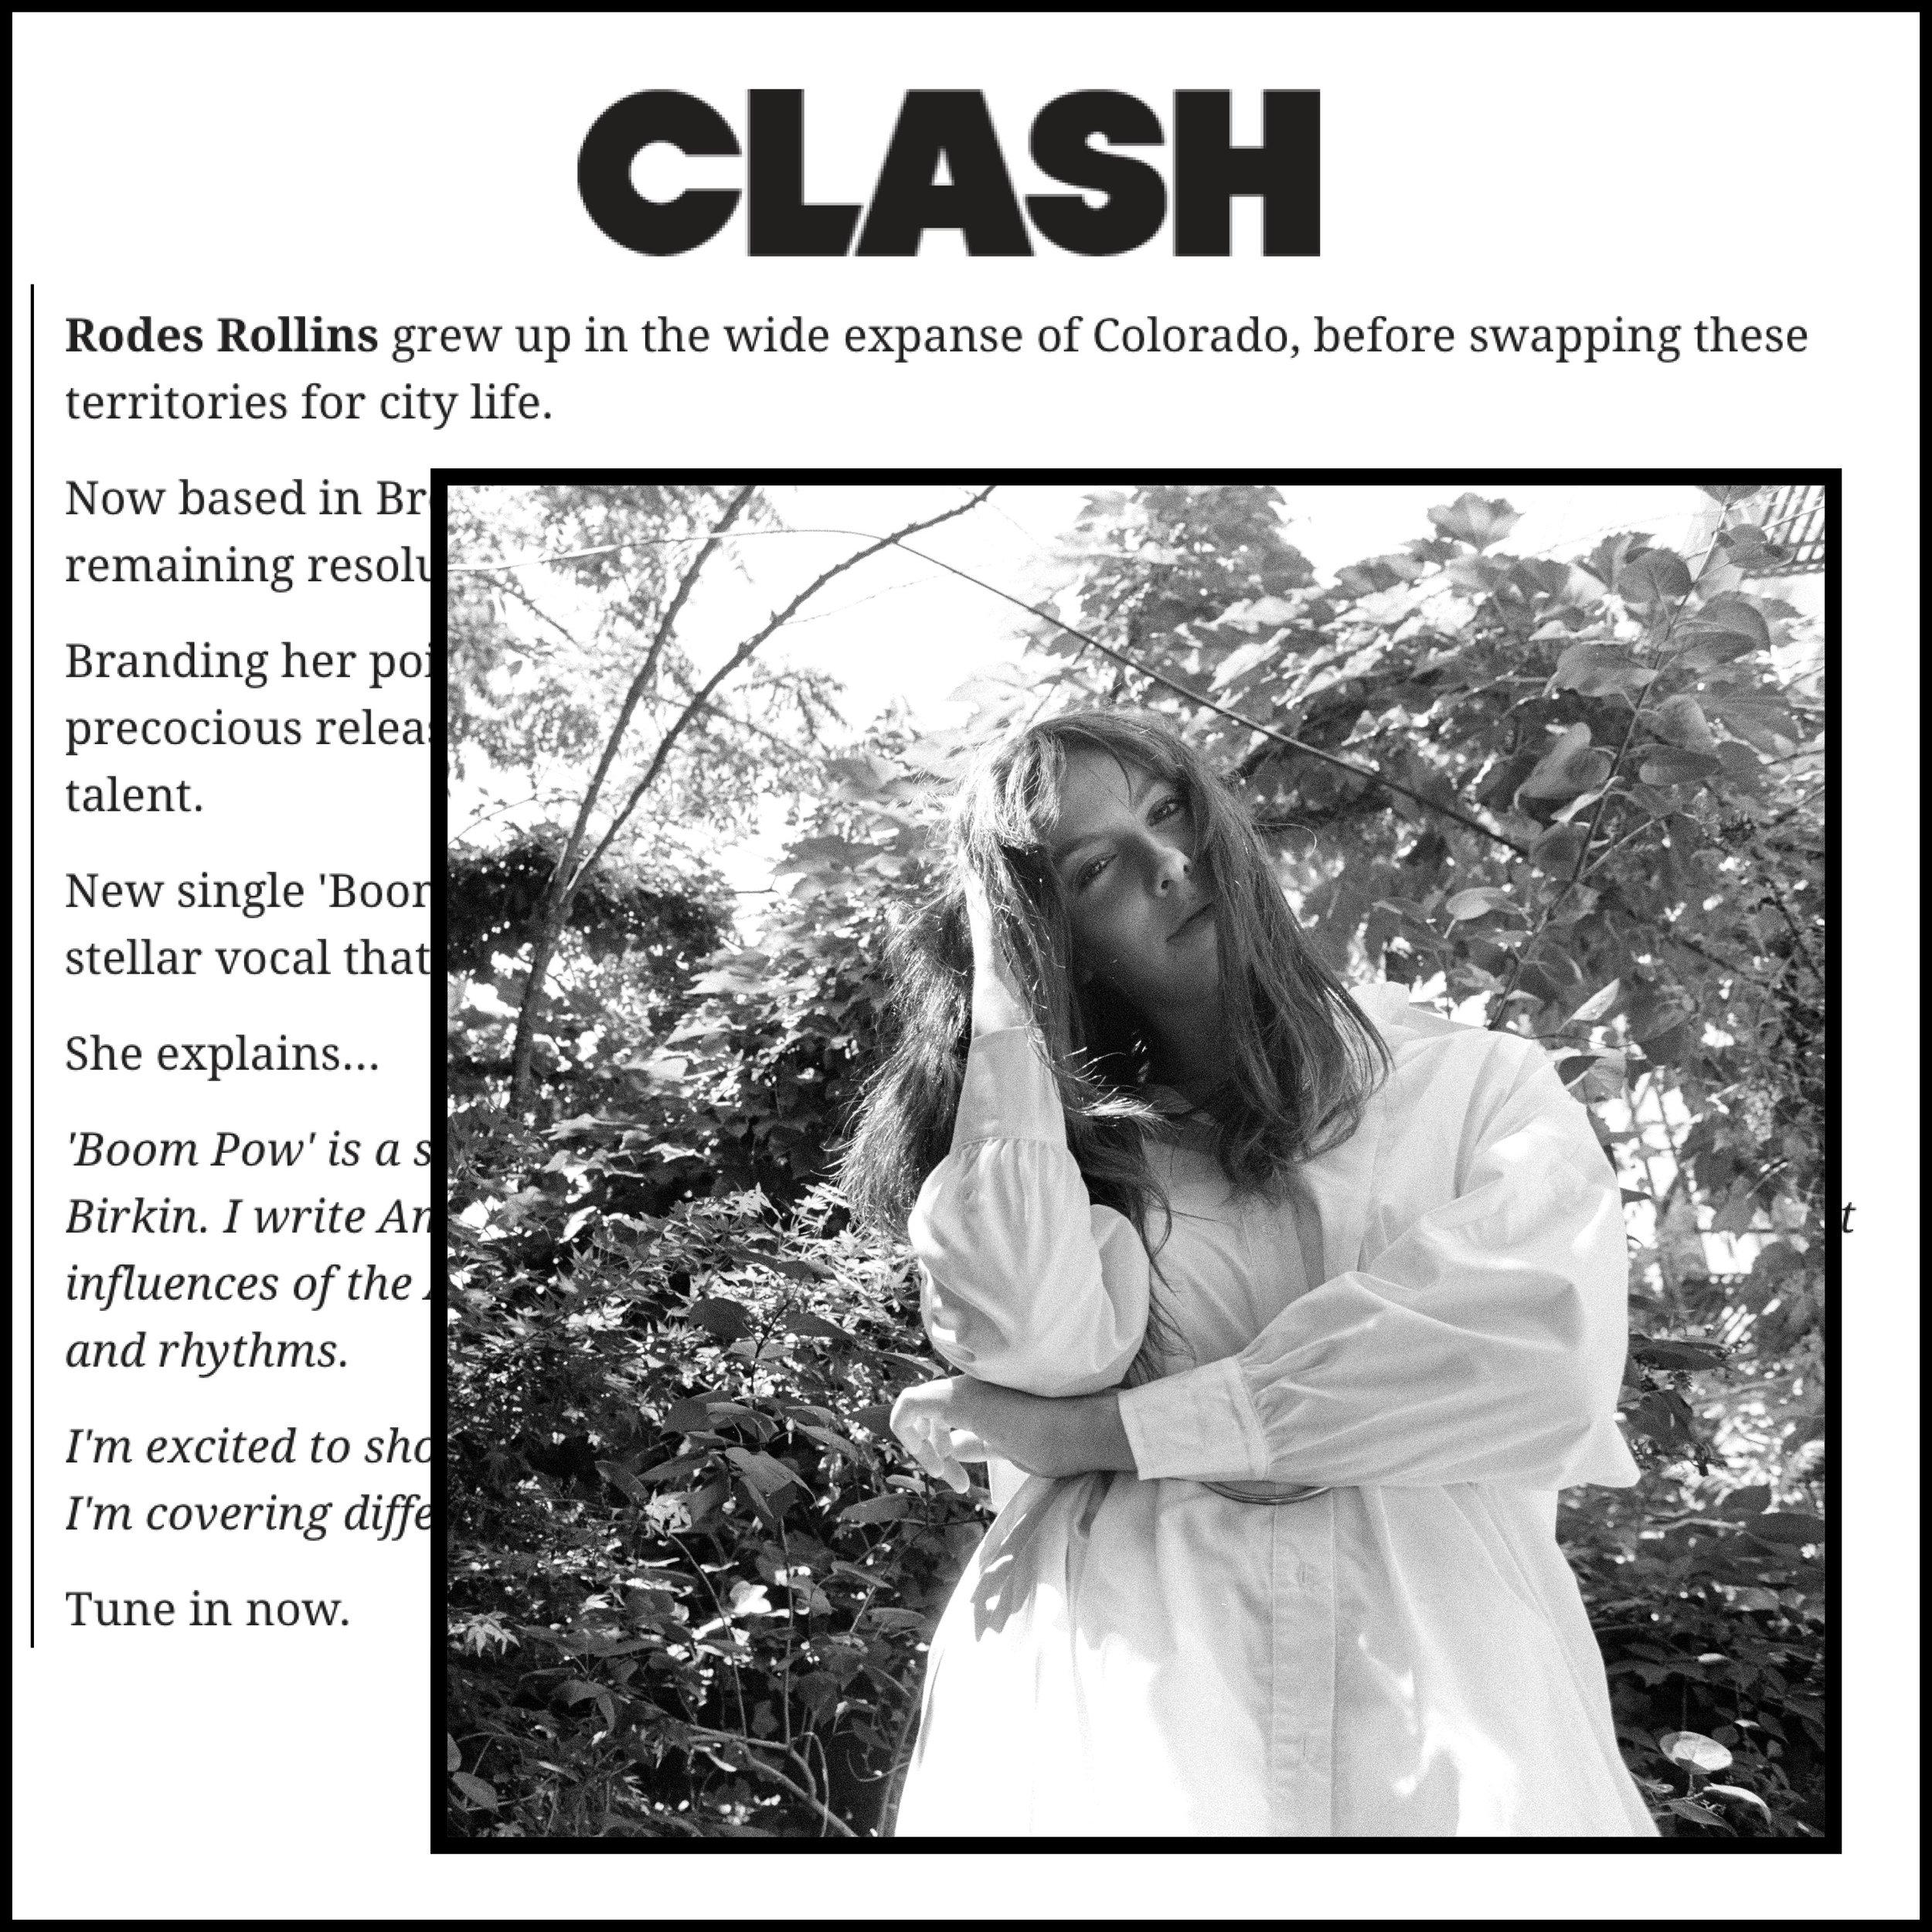 Link -  CLASH Magazine